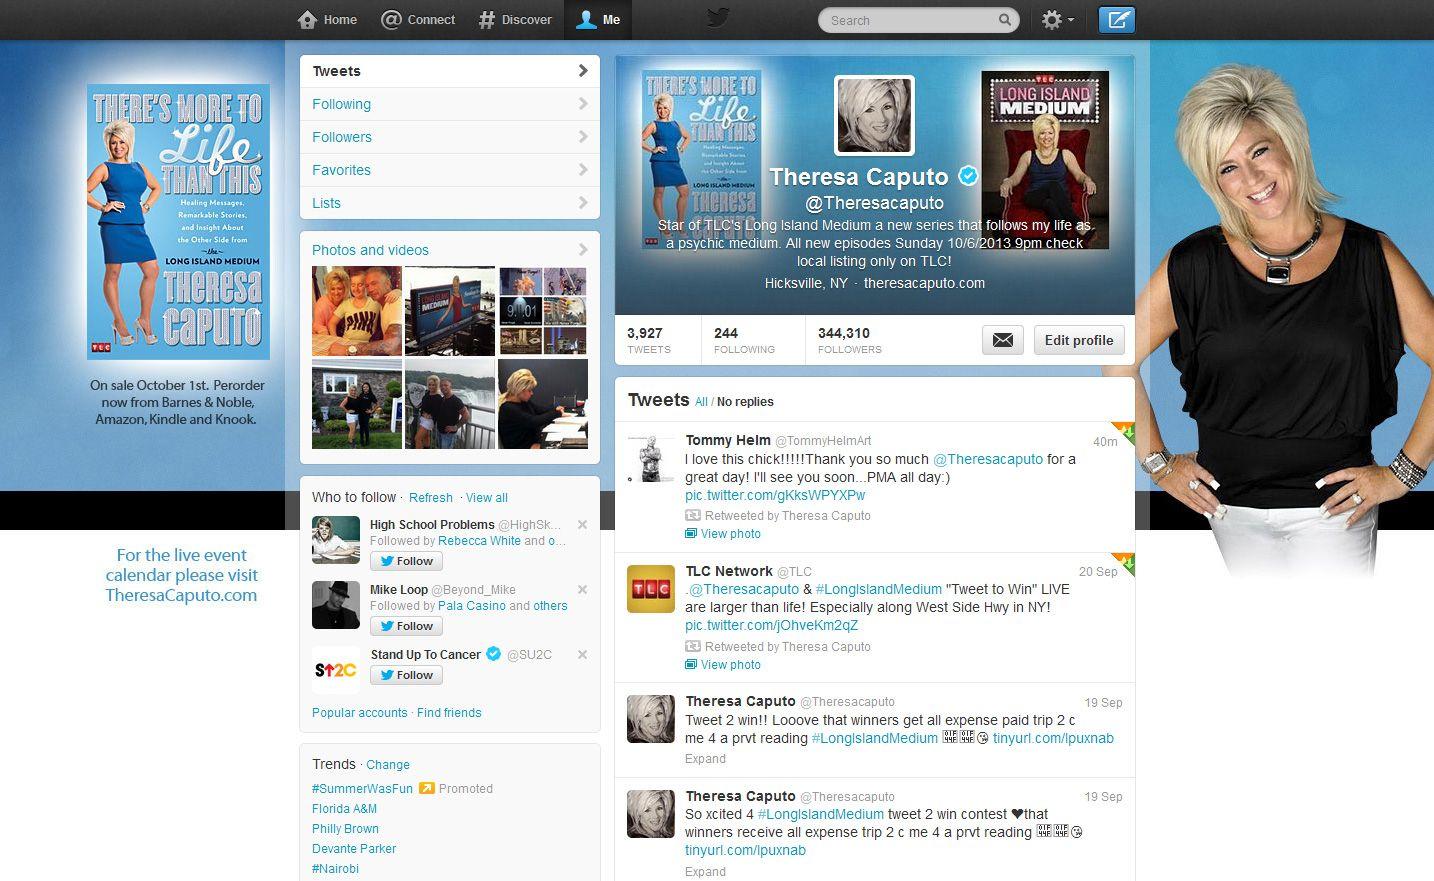 Twitter design for Theresa Caputo, the Long Island Medium.